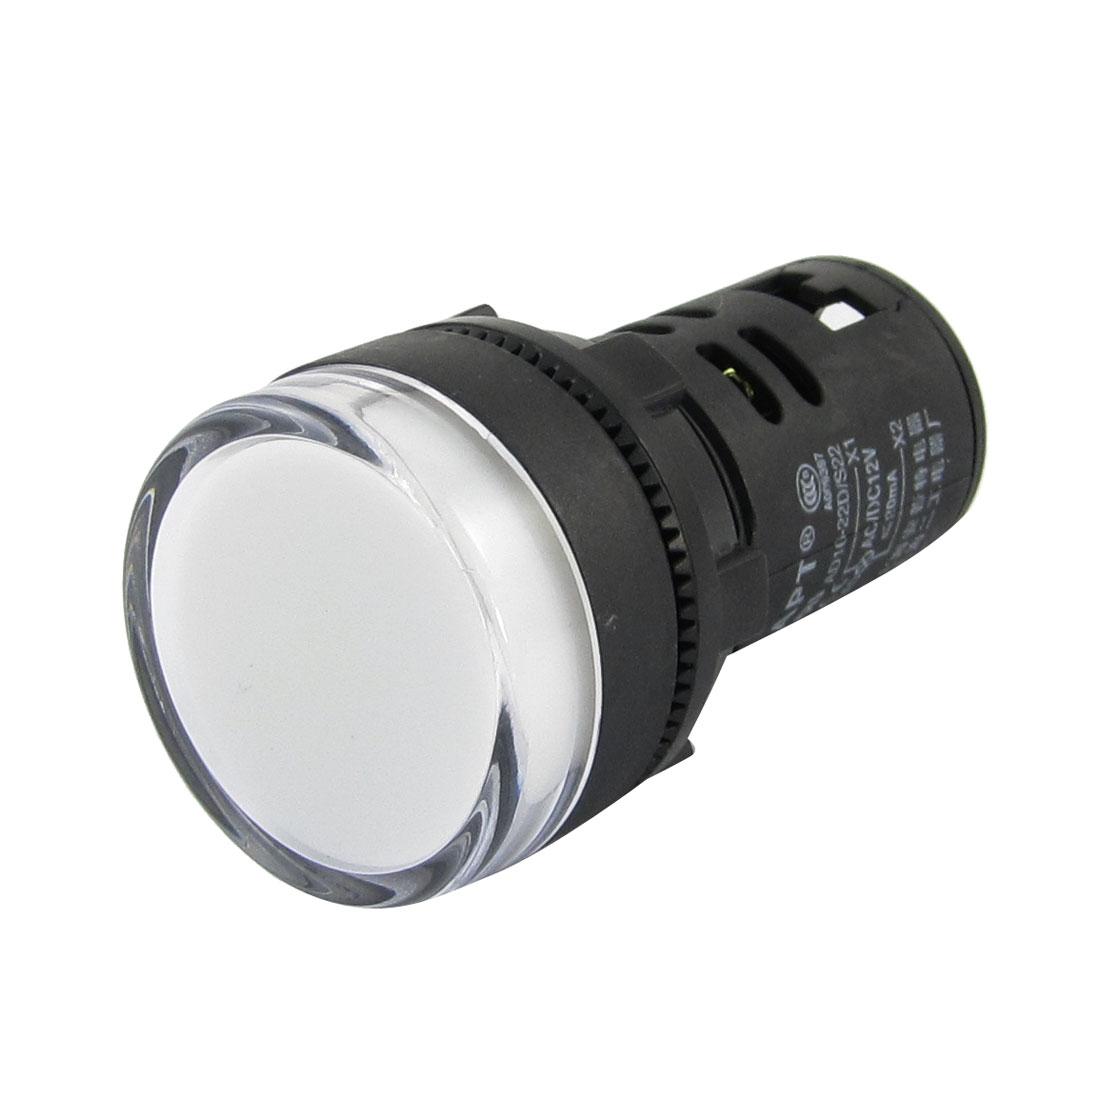 Electrical Circuit White LED Signal Indicator Light AC/DC12V 20mA